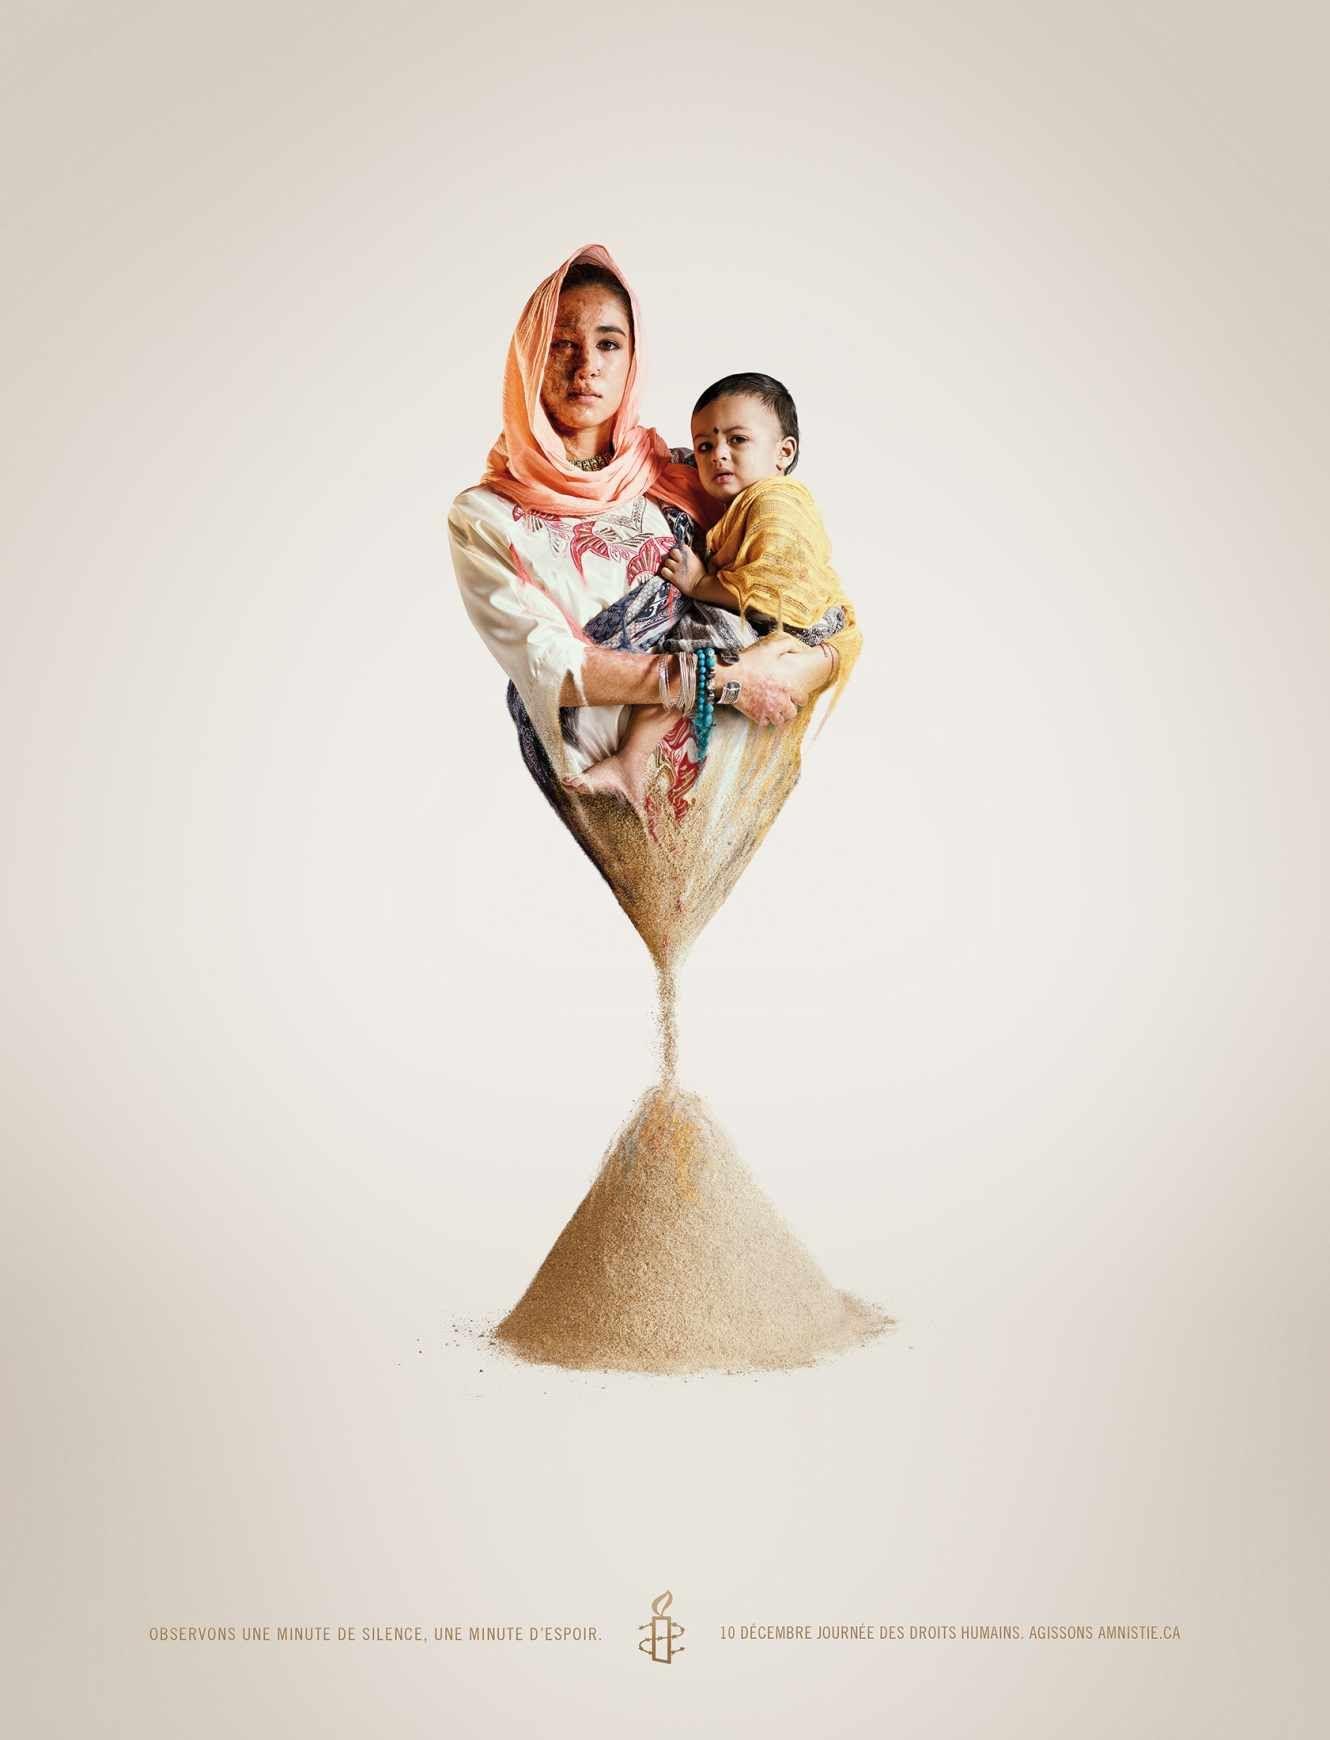 Amnesty International: Minute of hope, 1